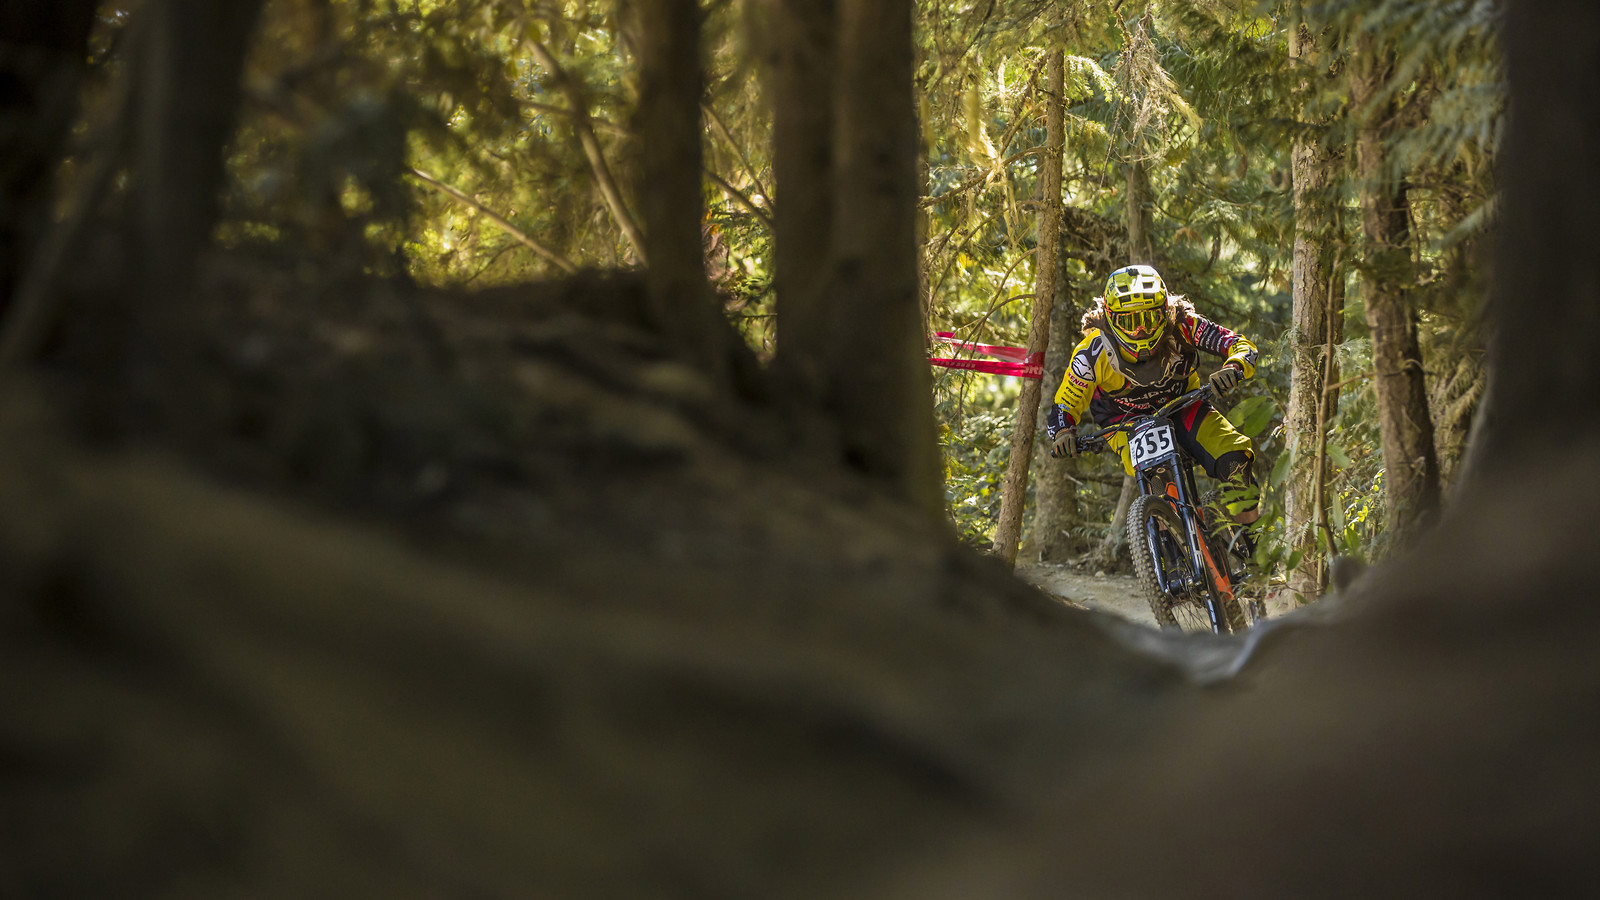 remy crankworx 2015 - phunkt.com - Mountain Biking Pictures - Vital MTB